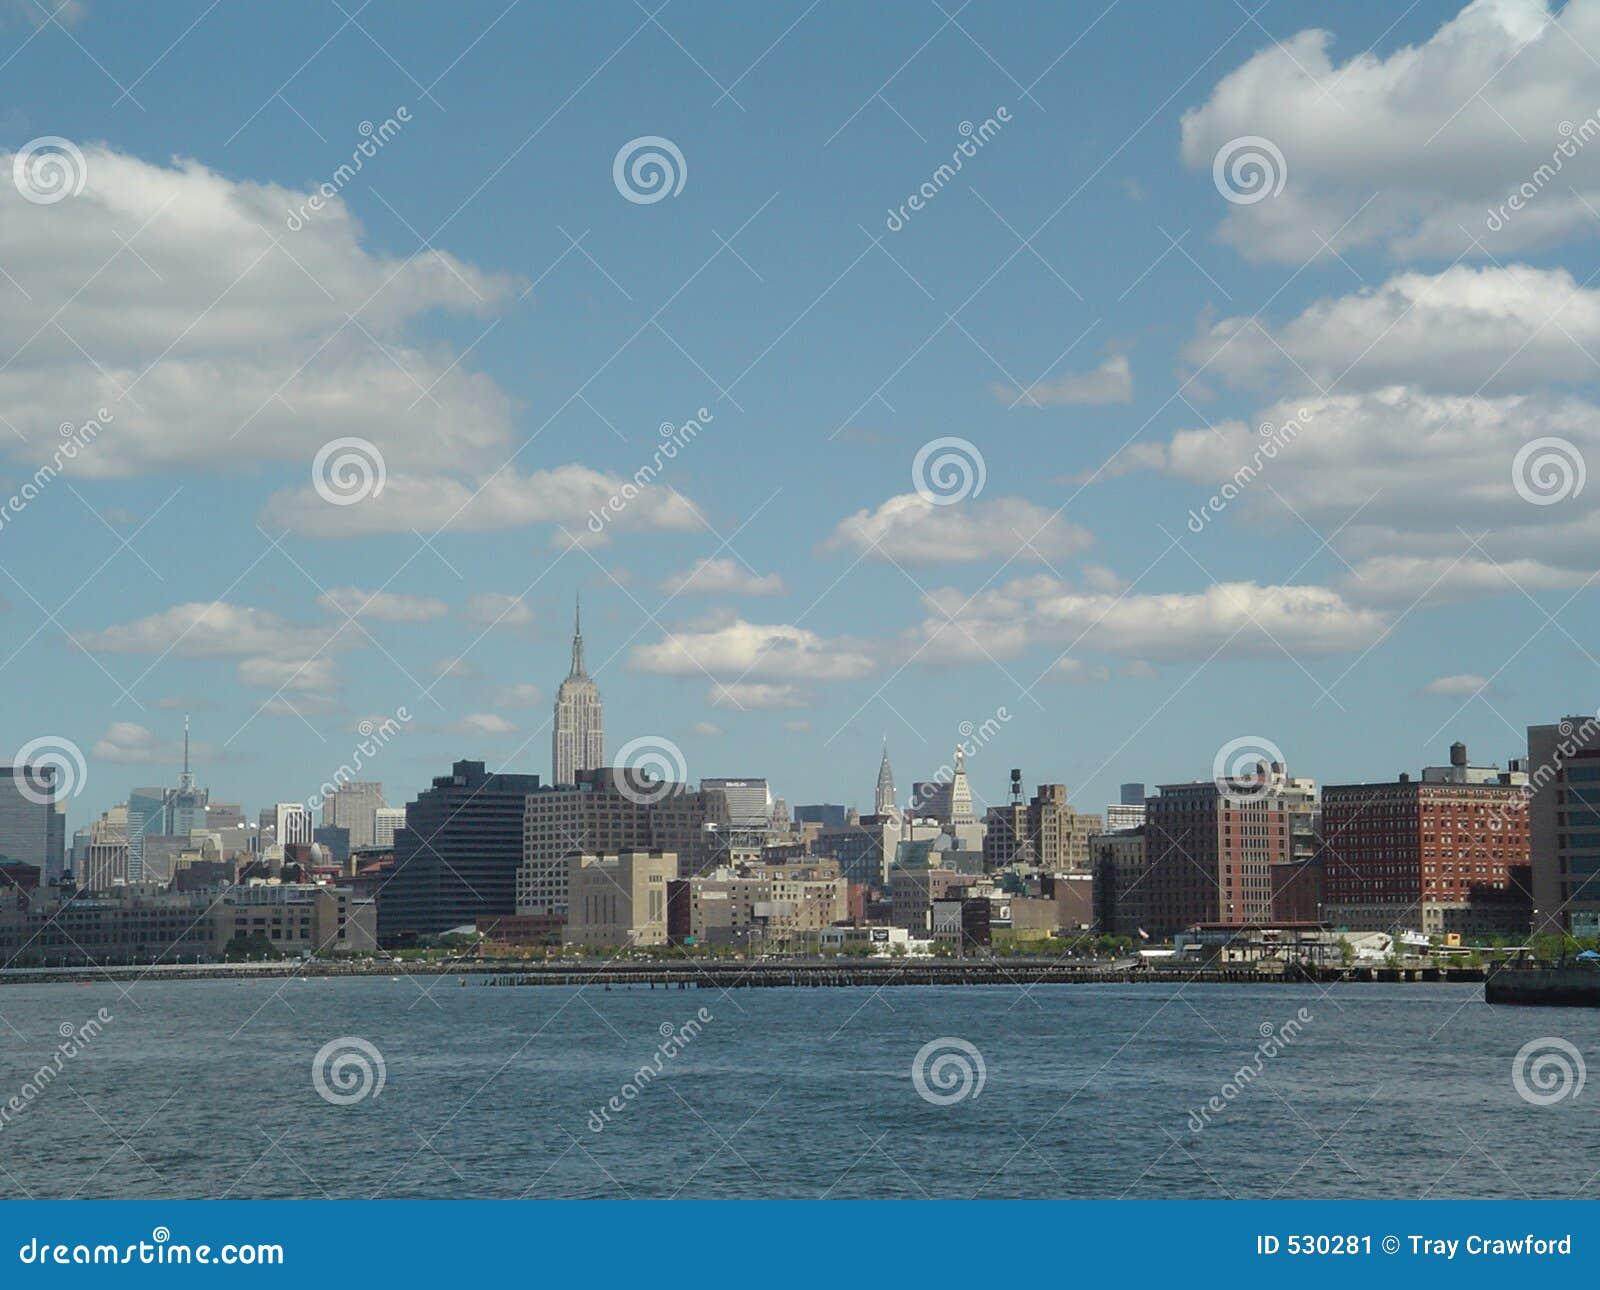 Download 纽约 库存图片. 图片 包括有 天空, 拱道, 城市, 小珠靠岸的, 风景, 视图, 背包徒步旅行者, 商业 - 530281